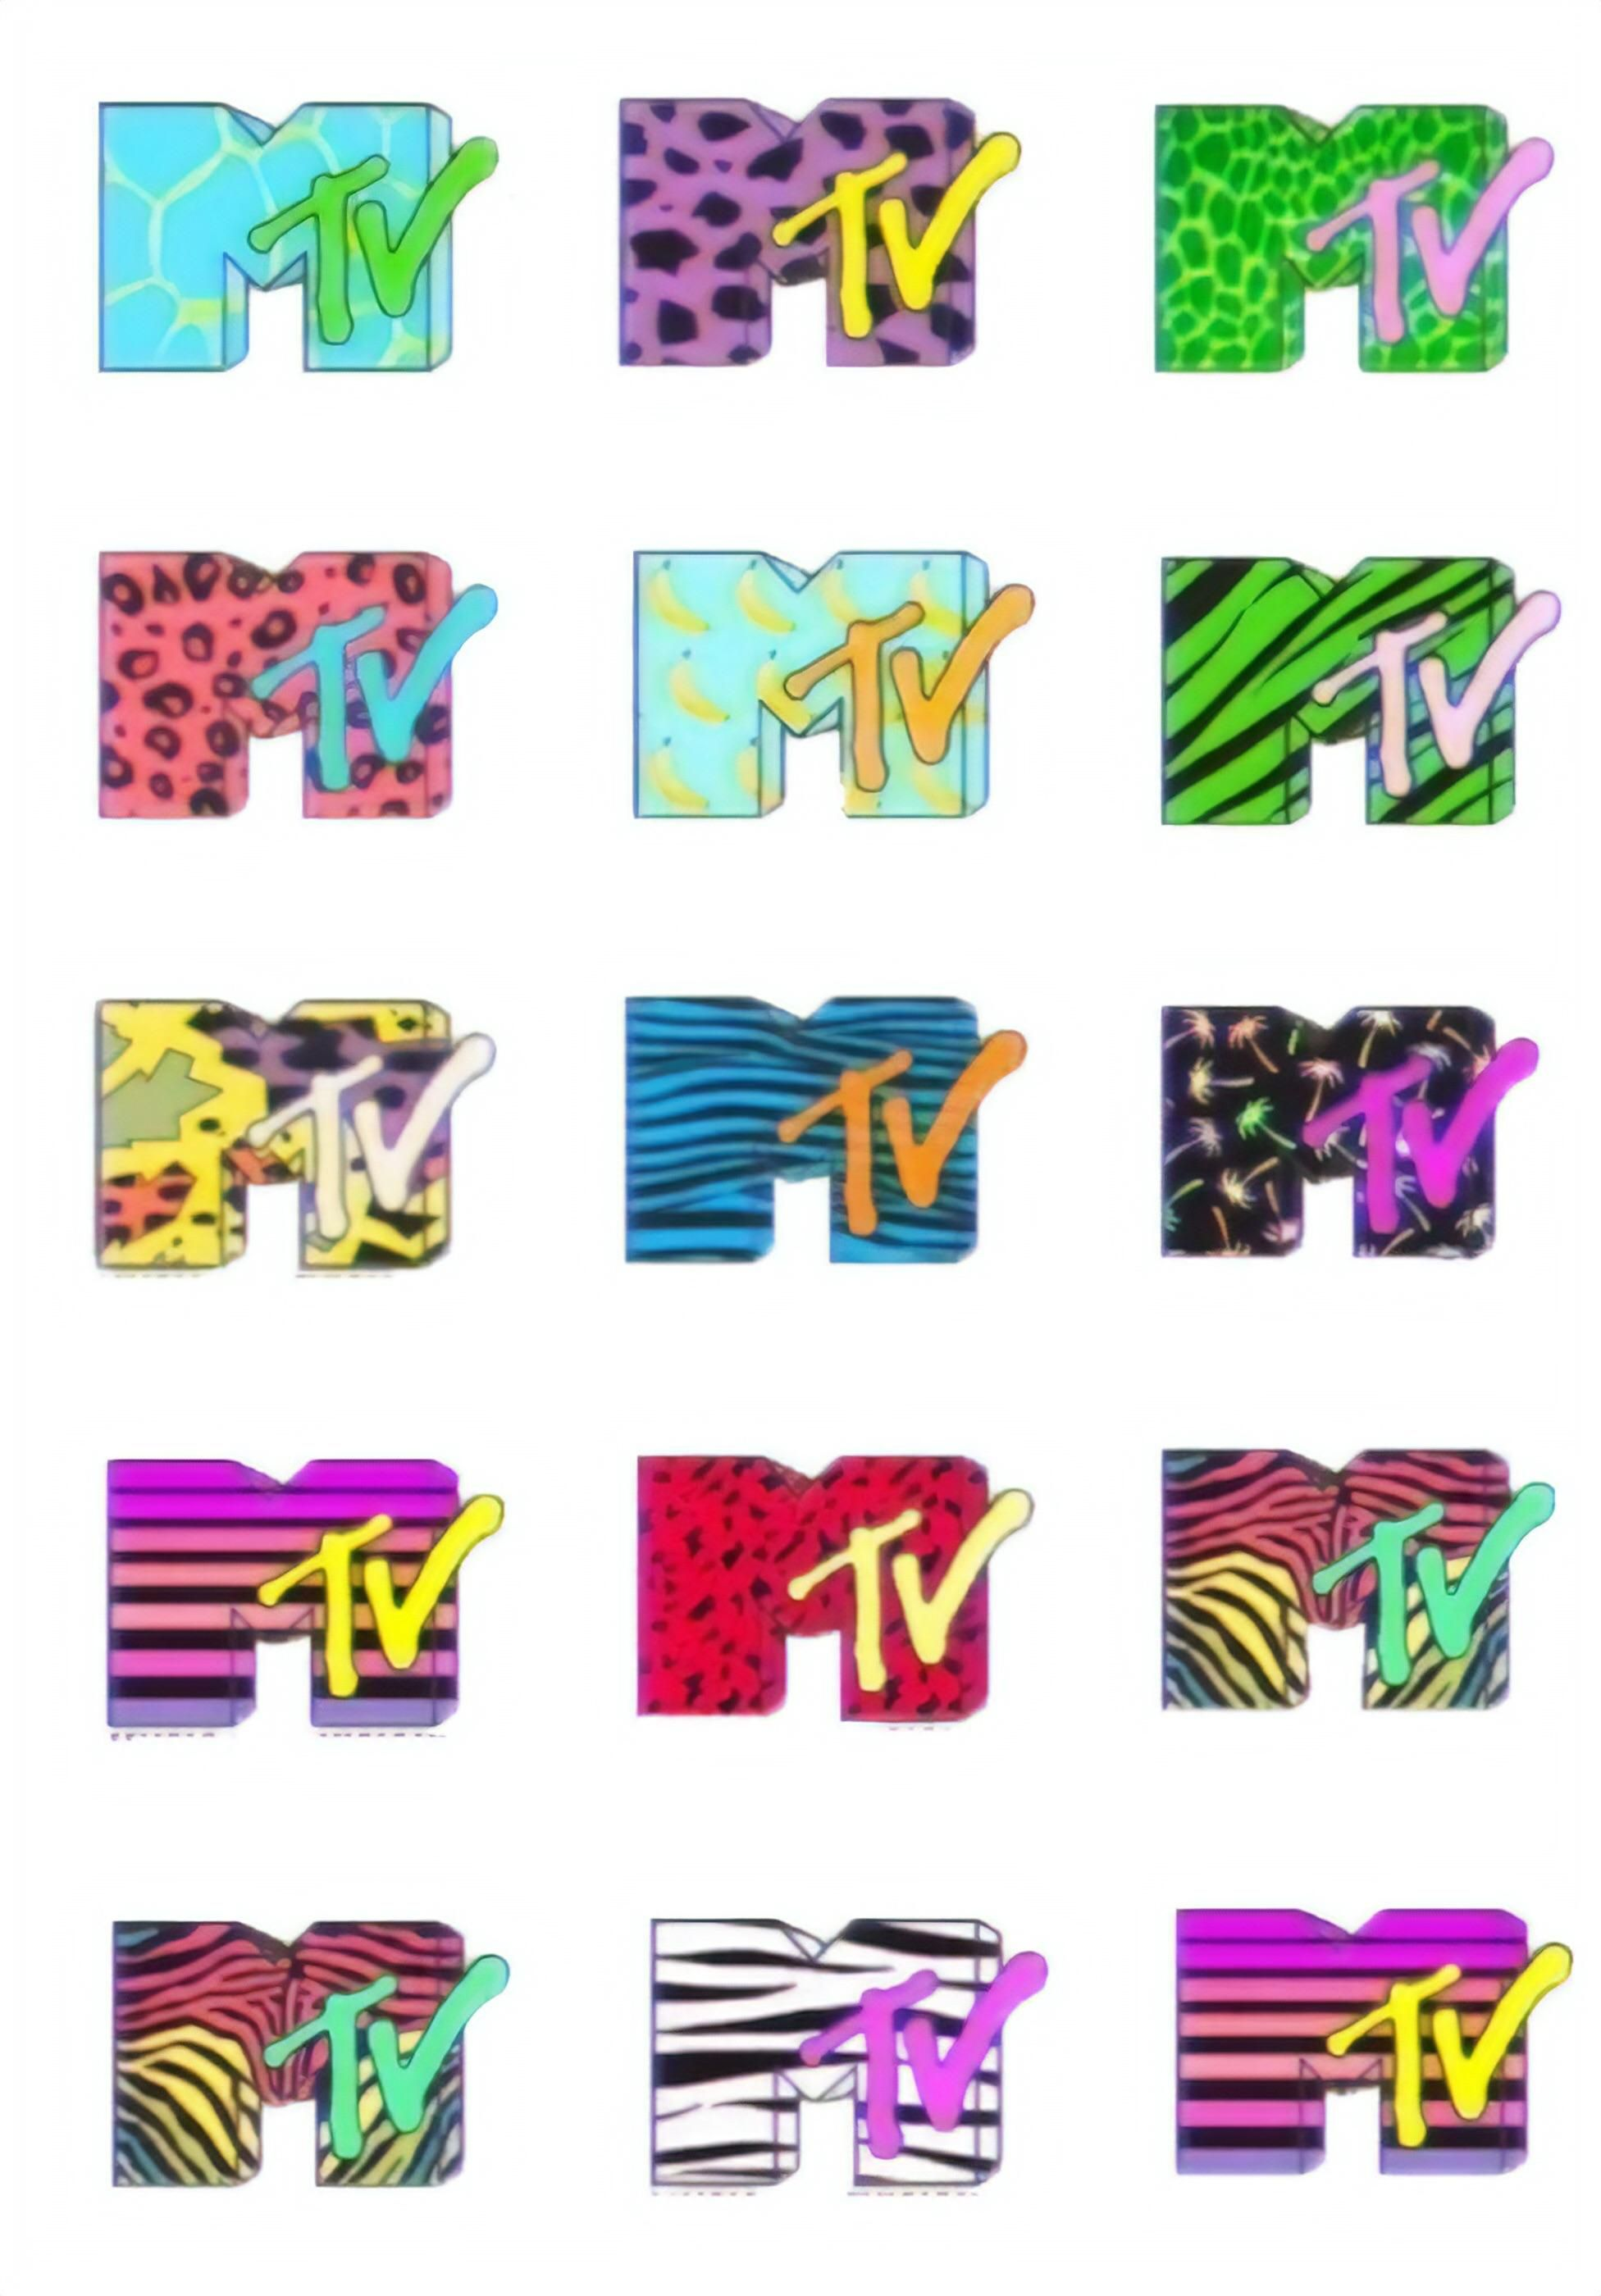 Vintage Mtv Logos Vaporwaveaesthetics Mtv Logo Mtv Retro